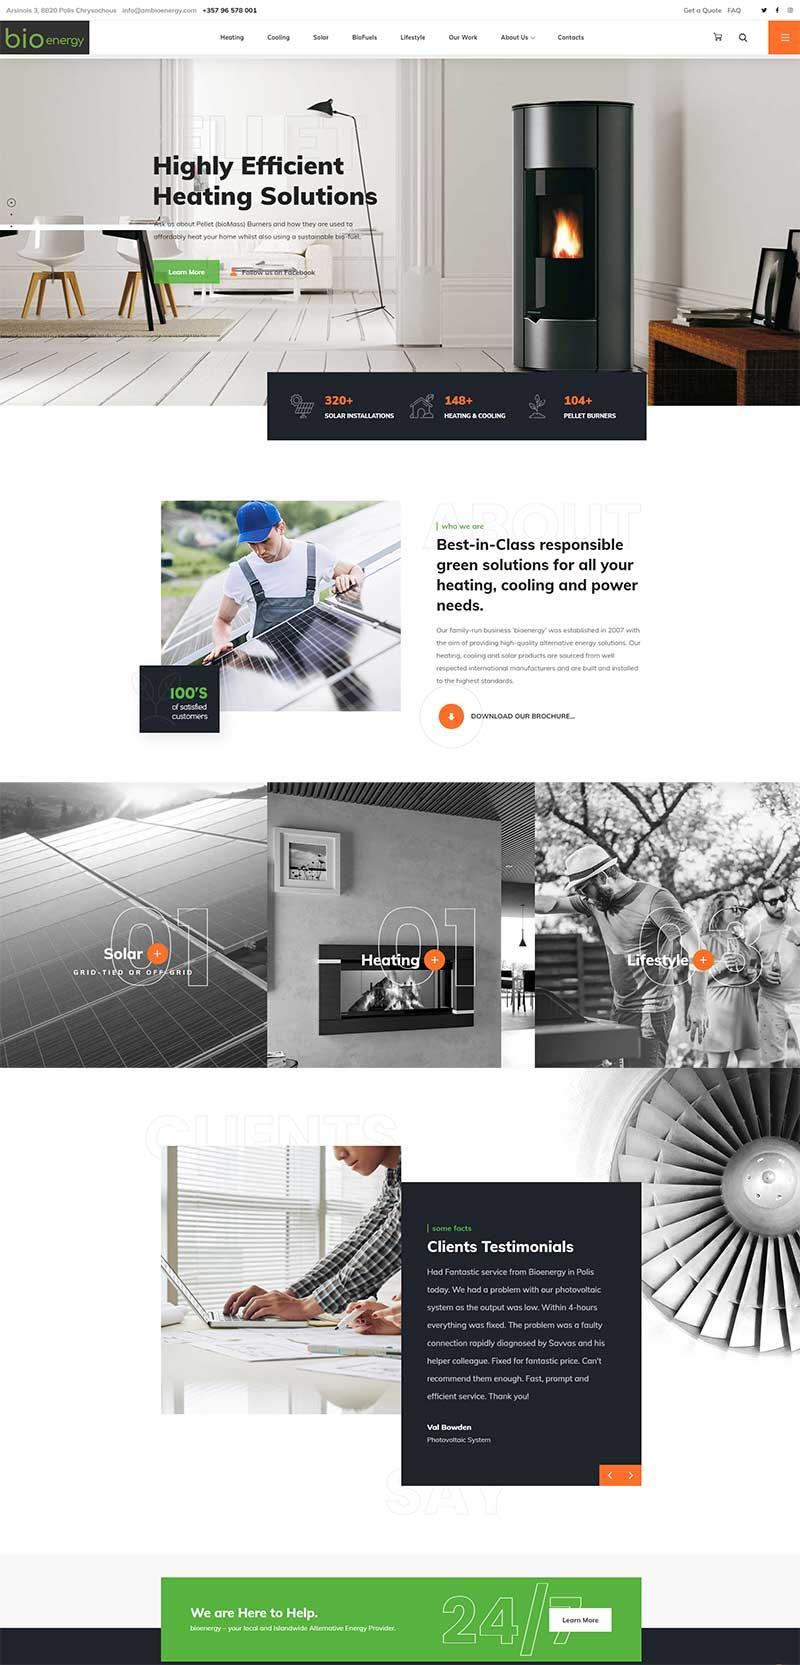 bioenergy website by gecko, cyprus website design